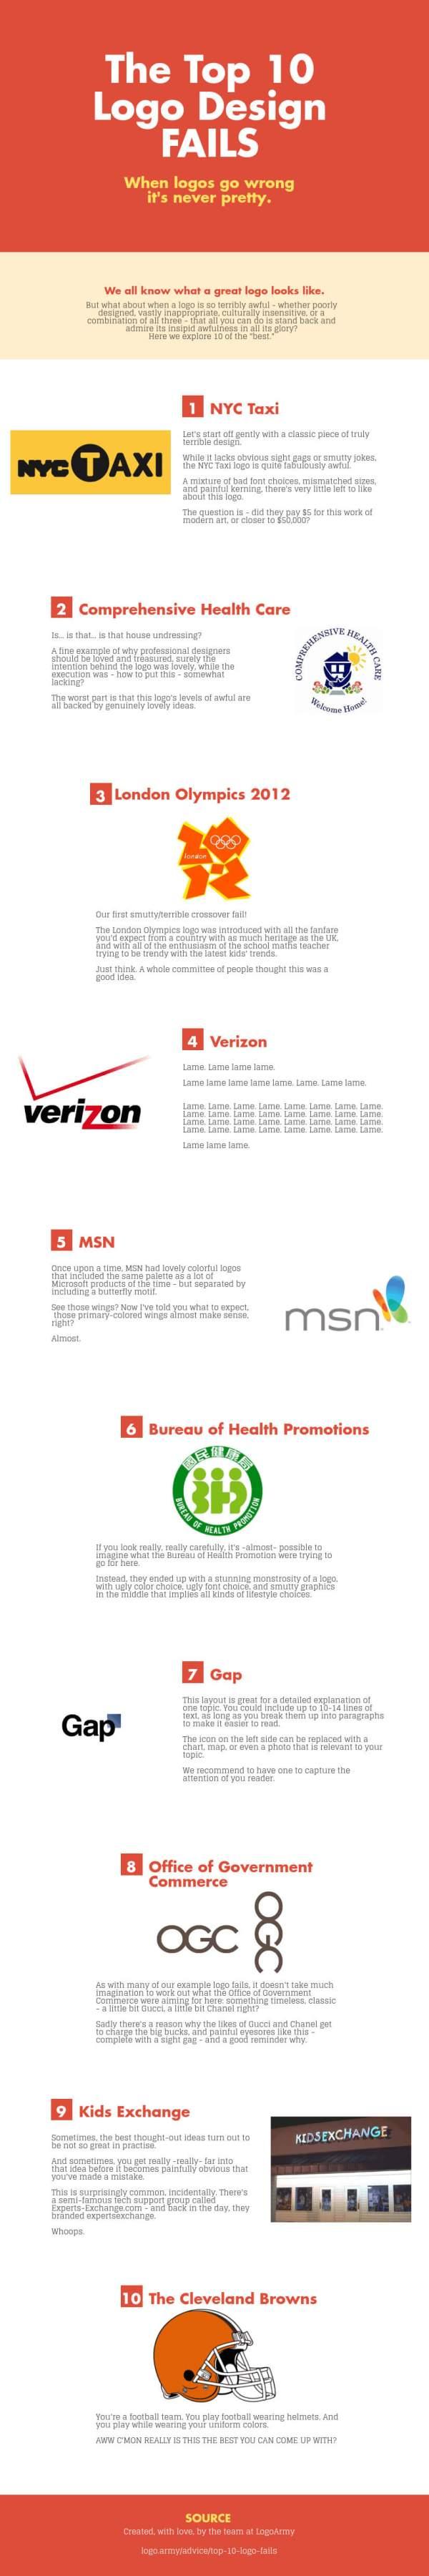 top-10-logo-fails-infographic